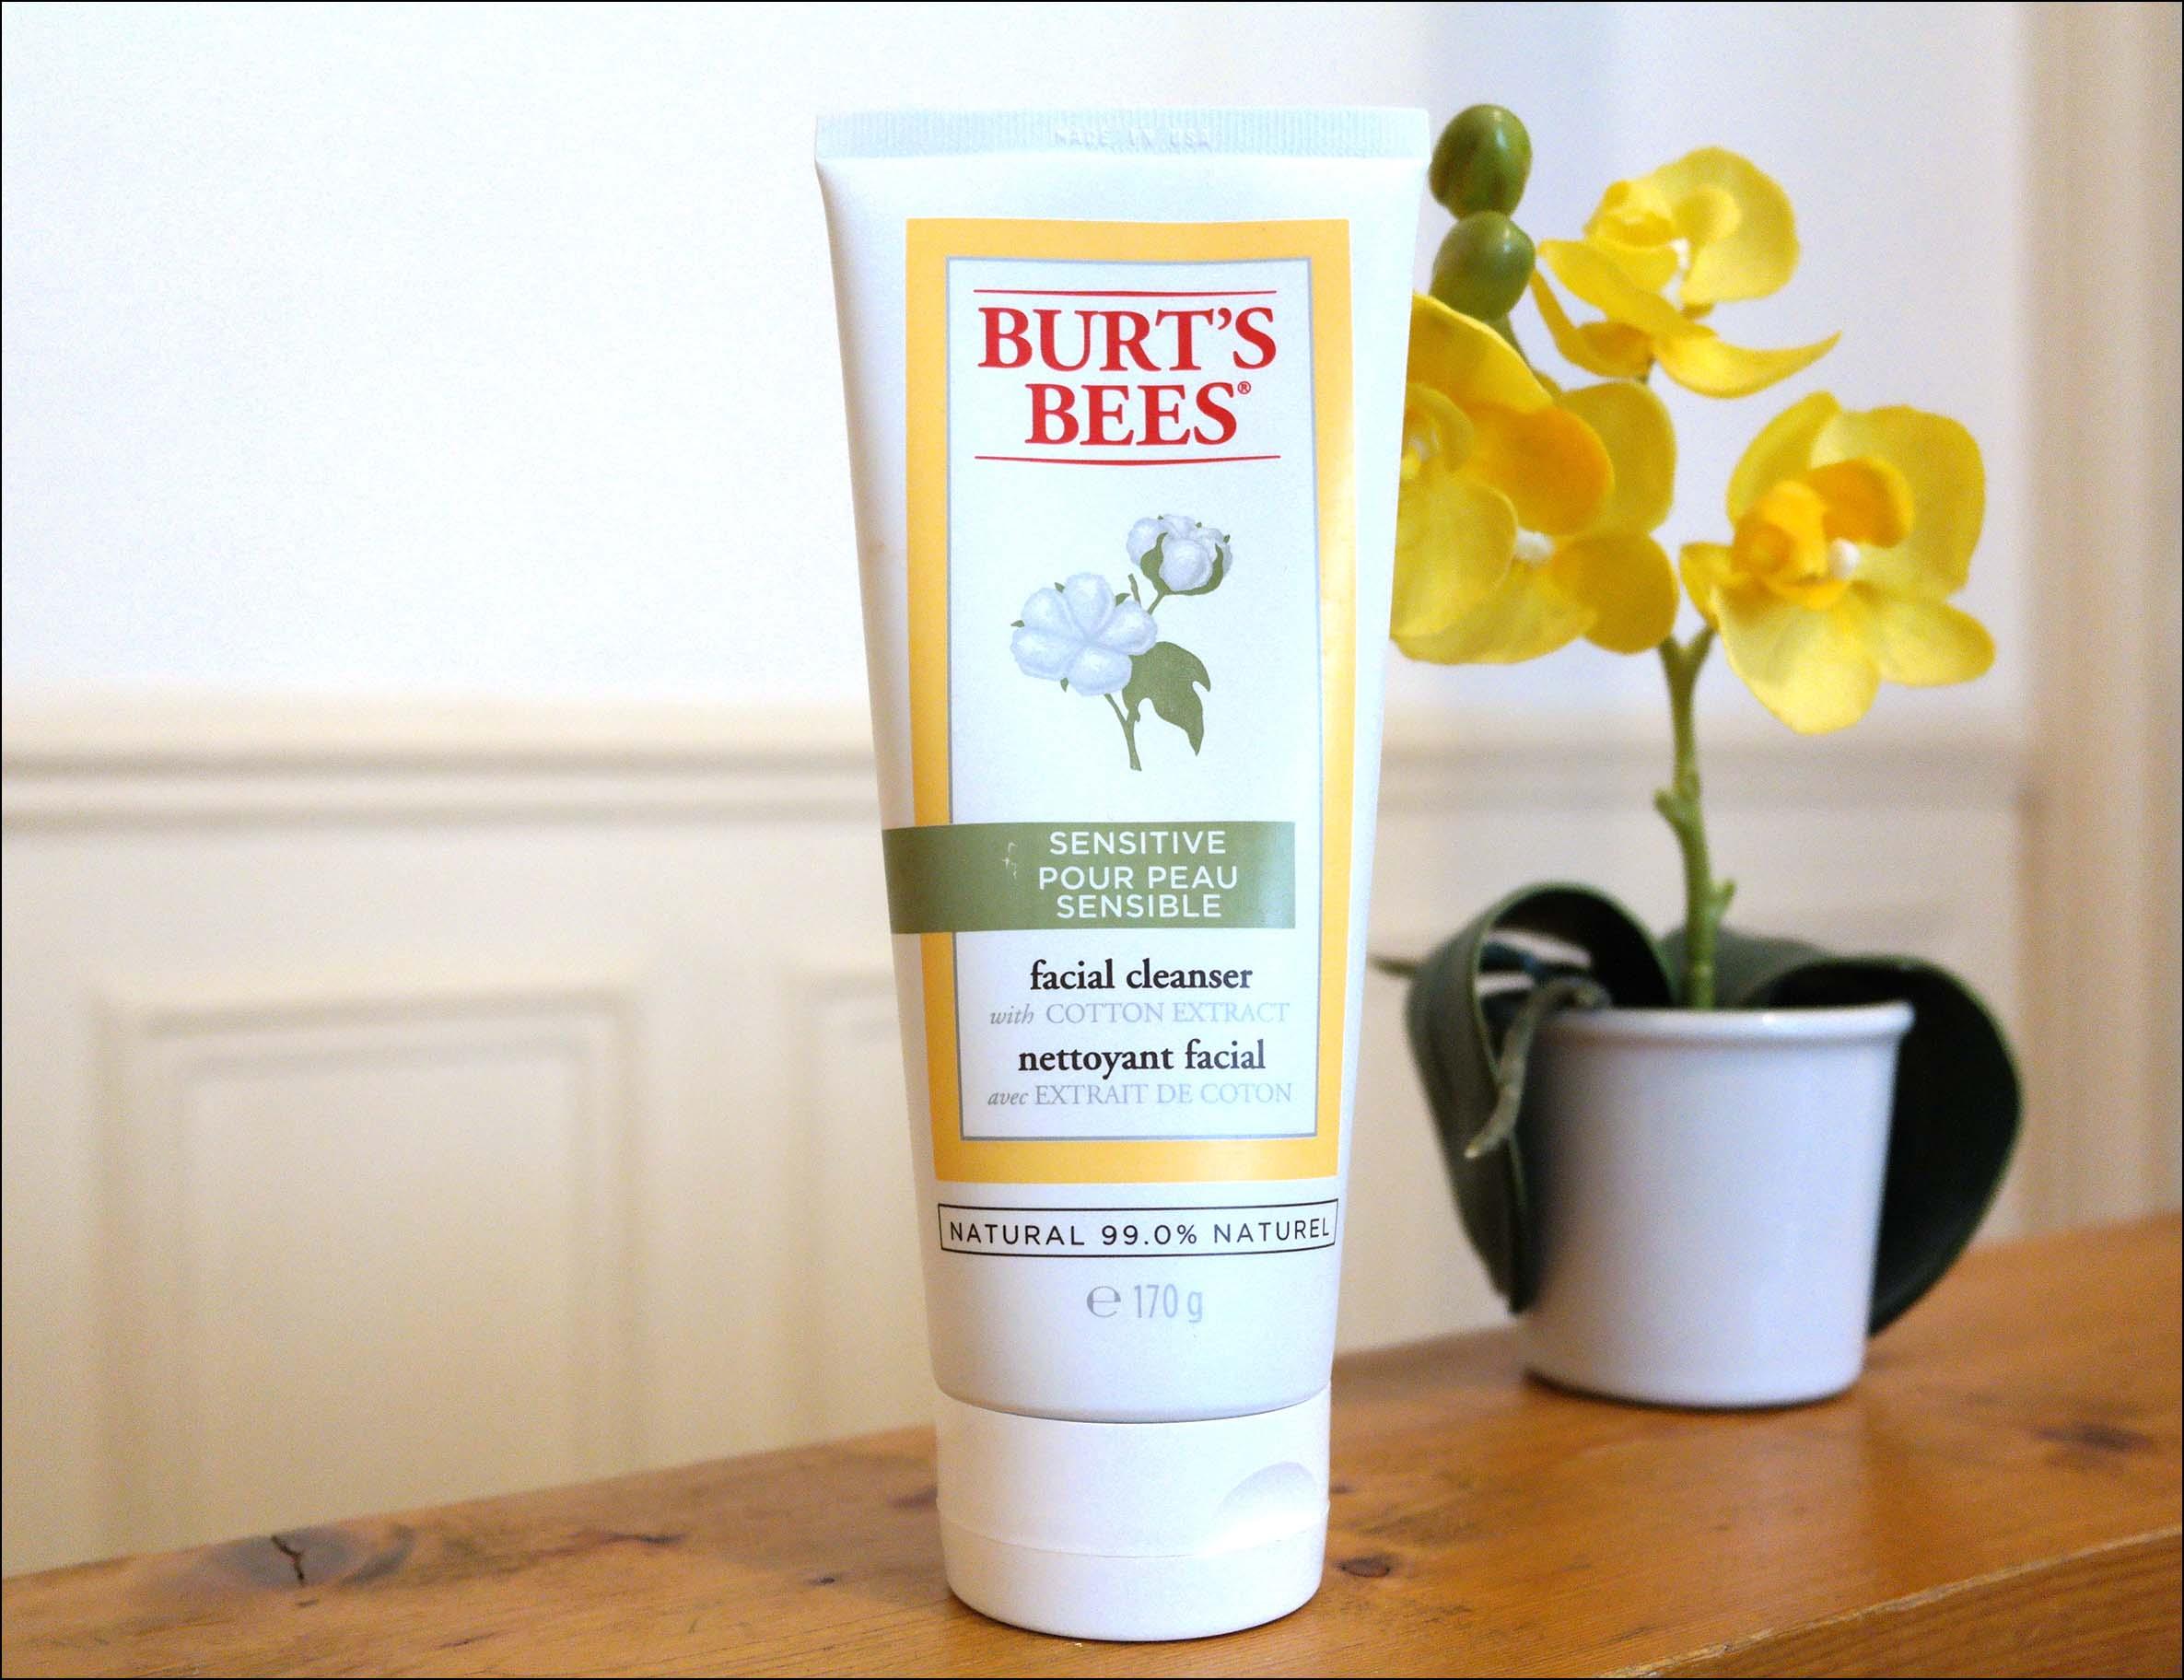 nettoyant, burt's bees, nettoyant burt's bees, crème sensitive, ecco verde